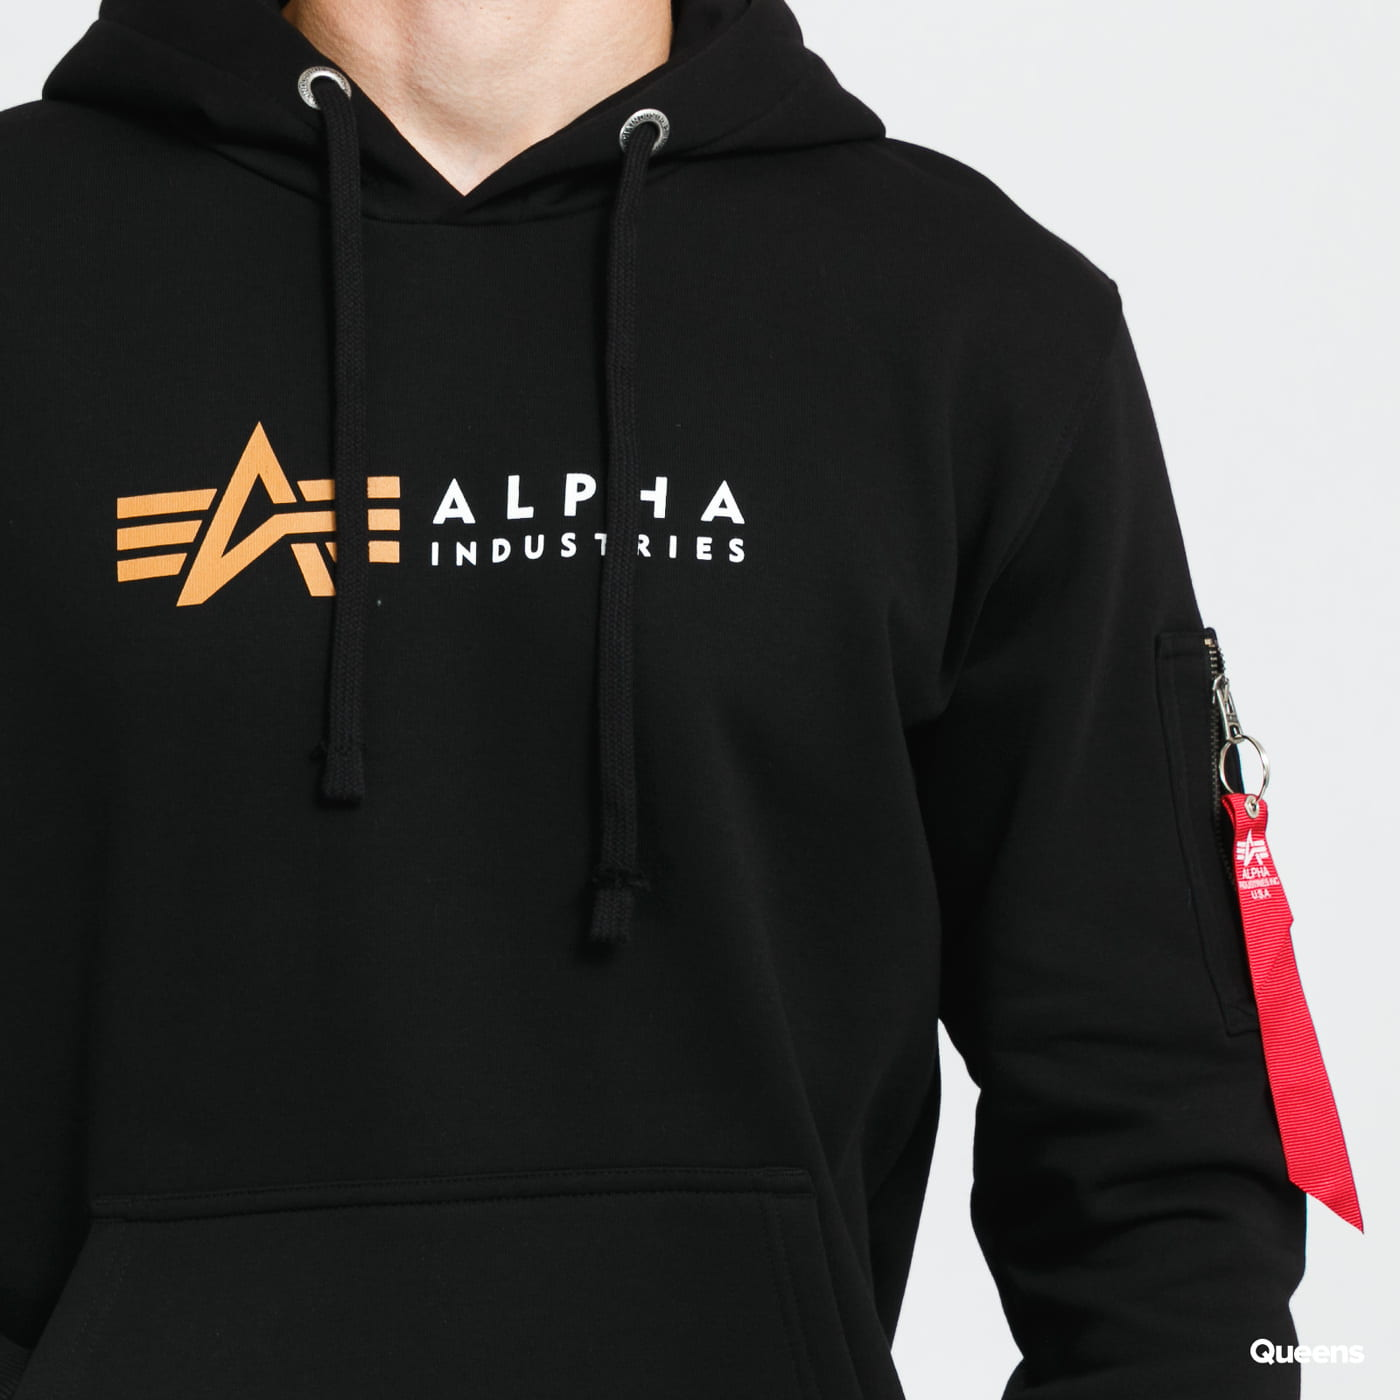 Alpha Industries Alpha Label Hoody gray / beige / pink / black